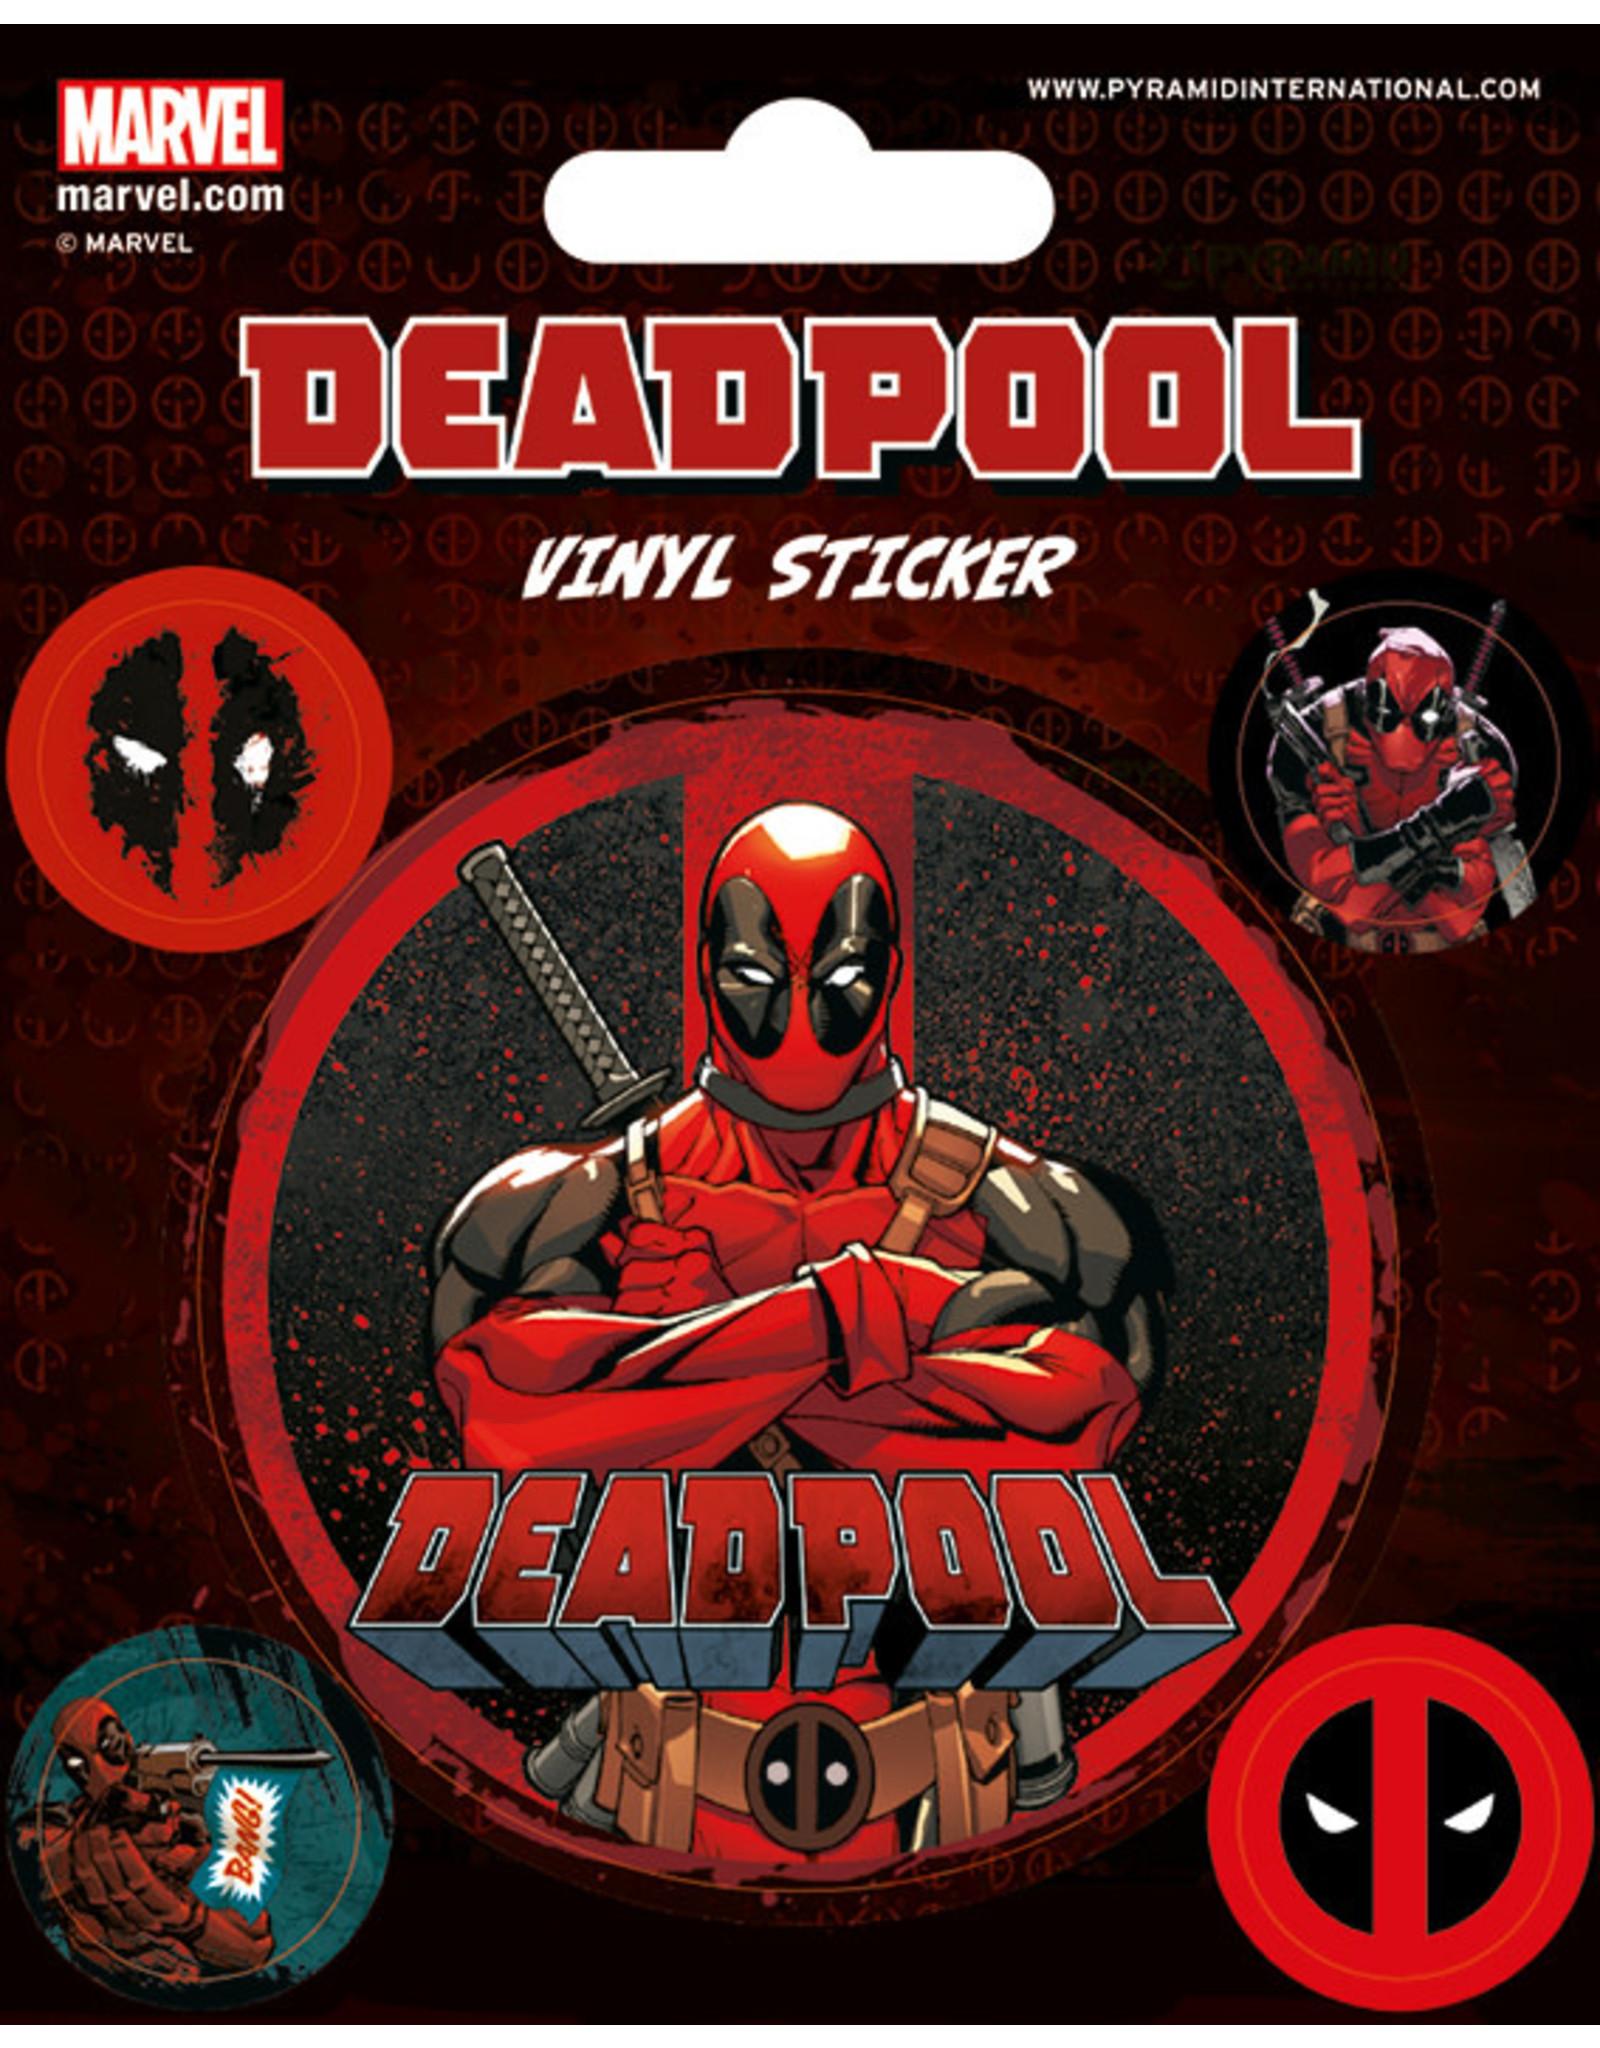 DEADPOOL Vinyl Stickers - Deadpool